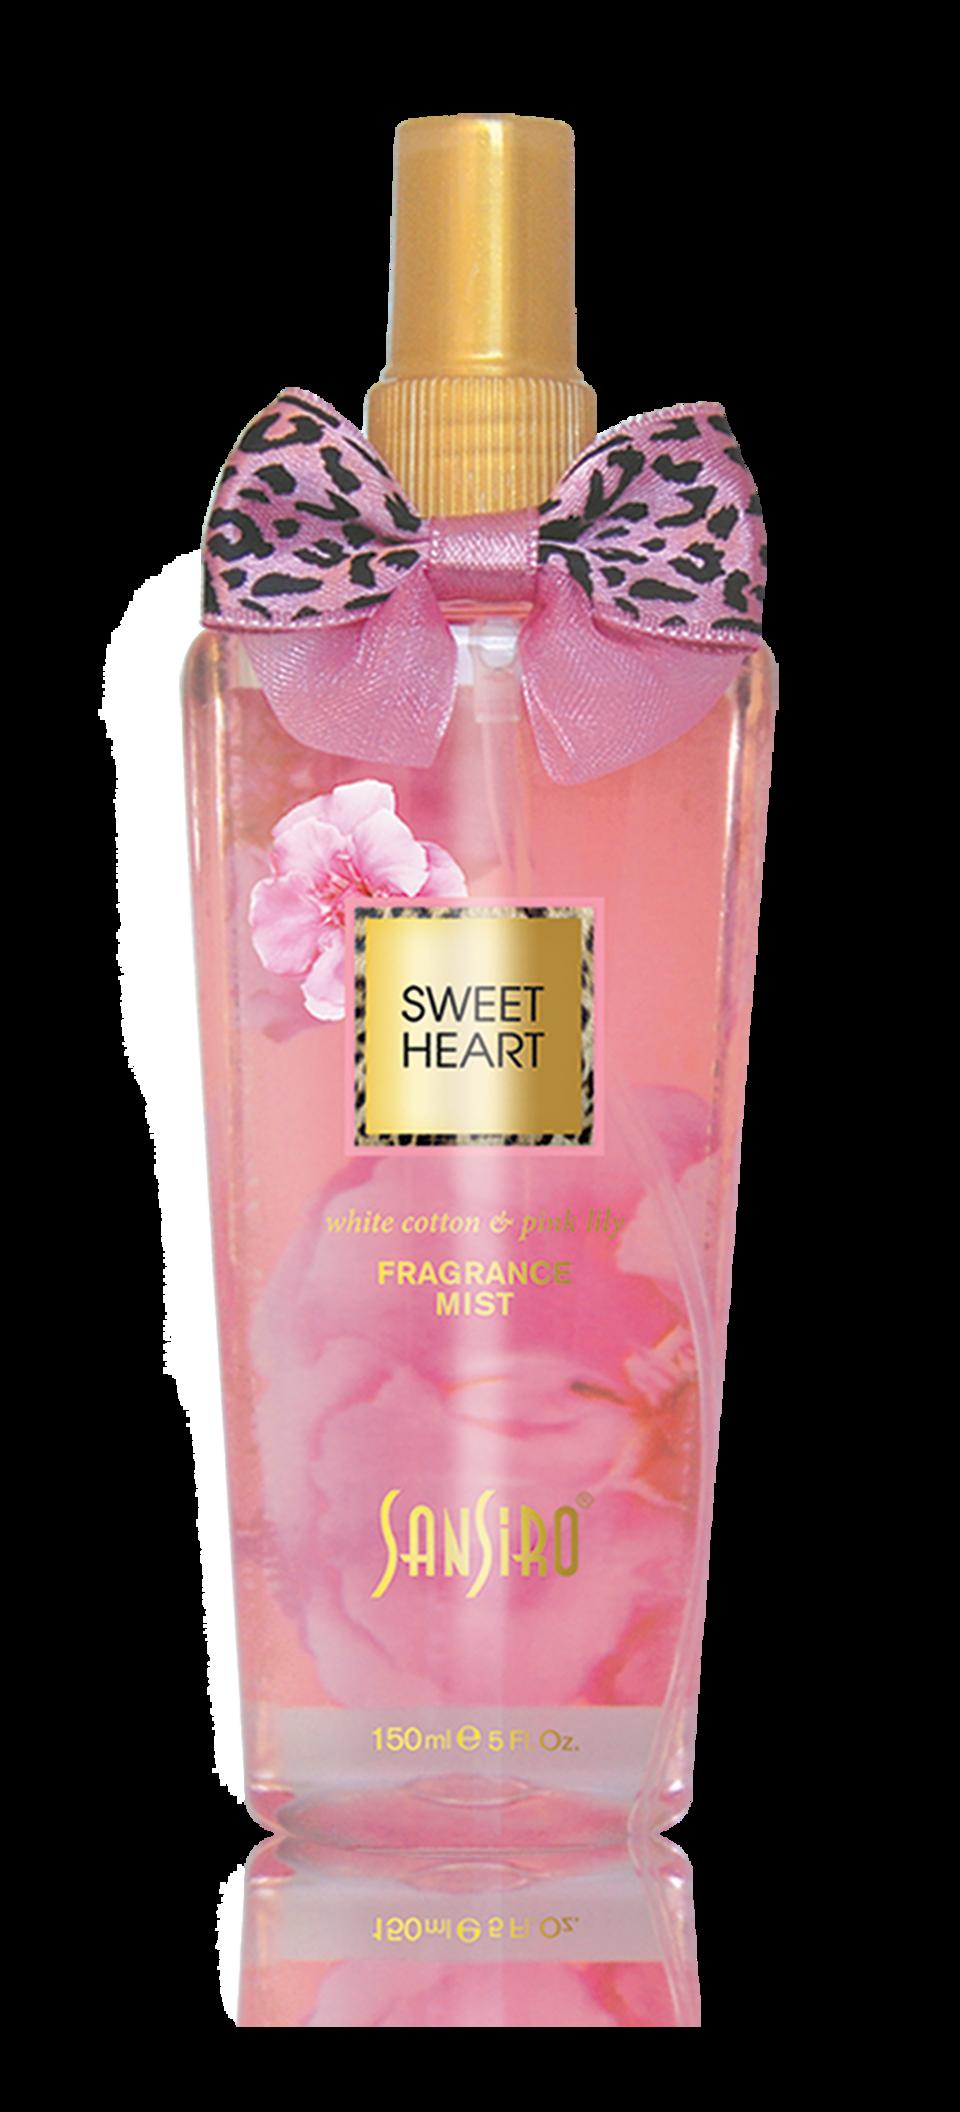 Sansiro Perfume - Body Splash - Fragrance Mist - Sweet Heart